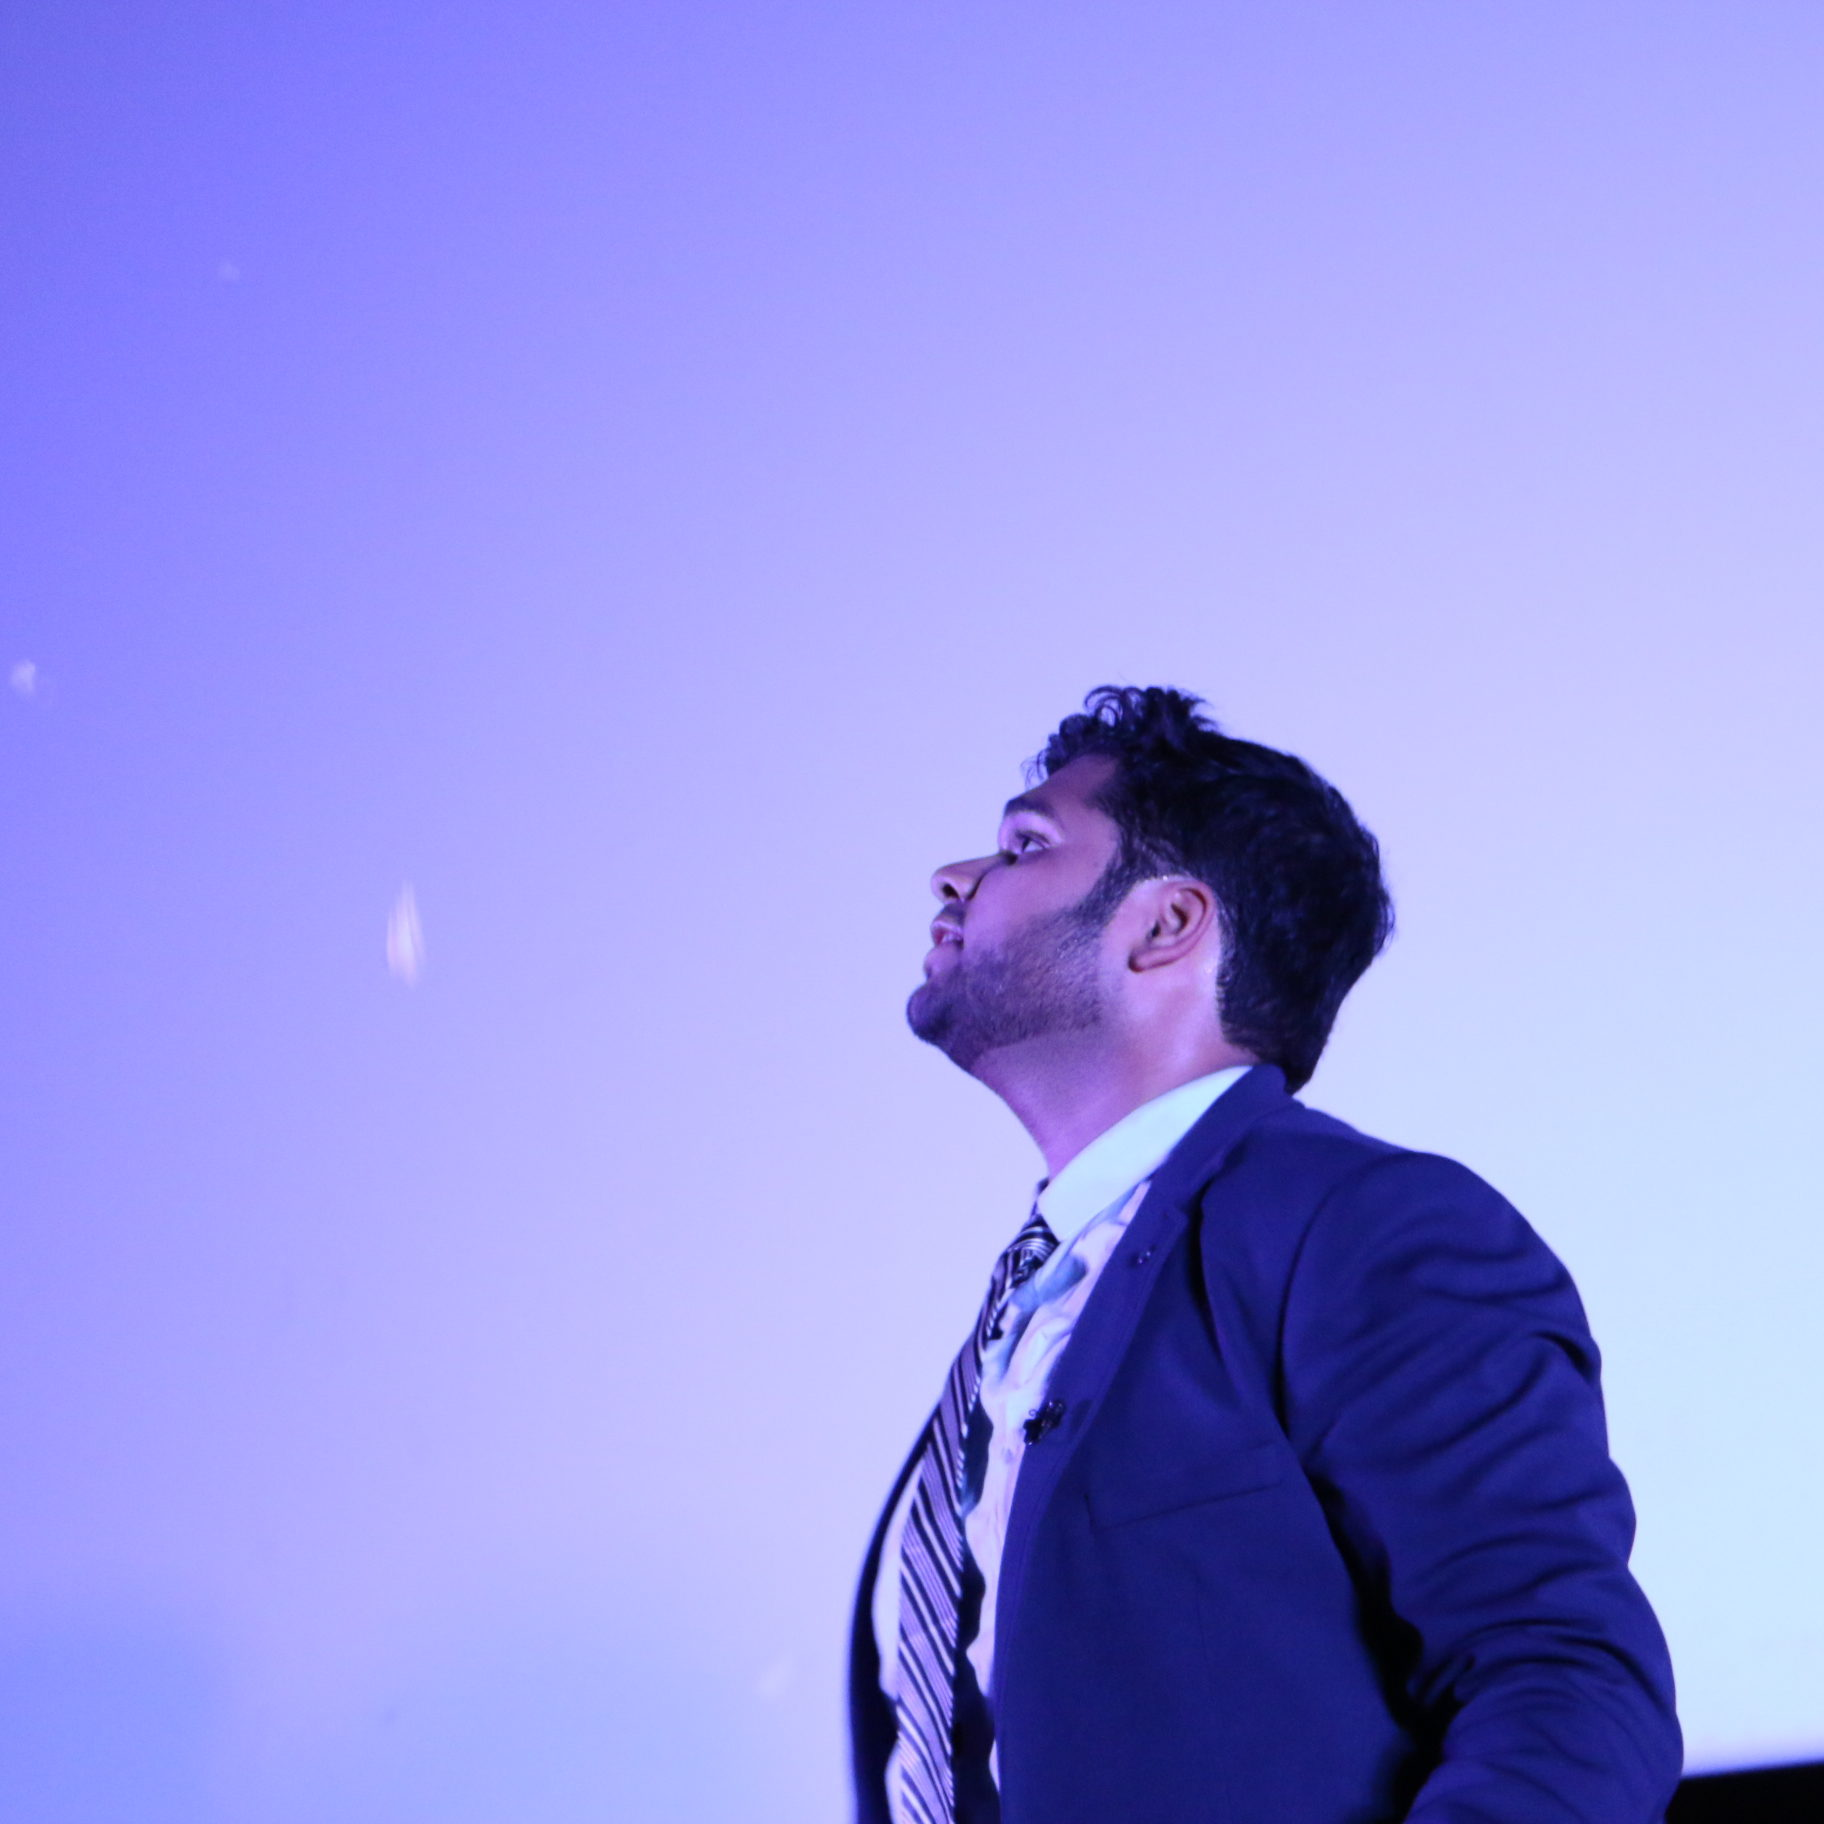 Kshitij Choudhary Performing